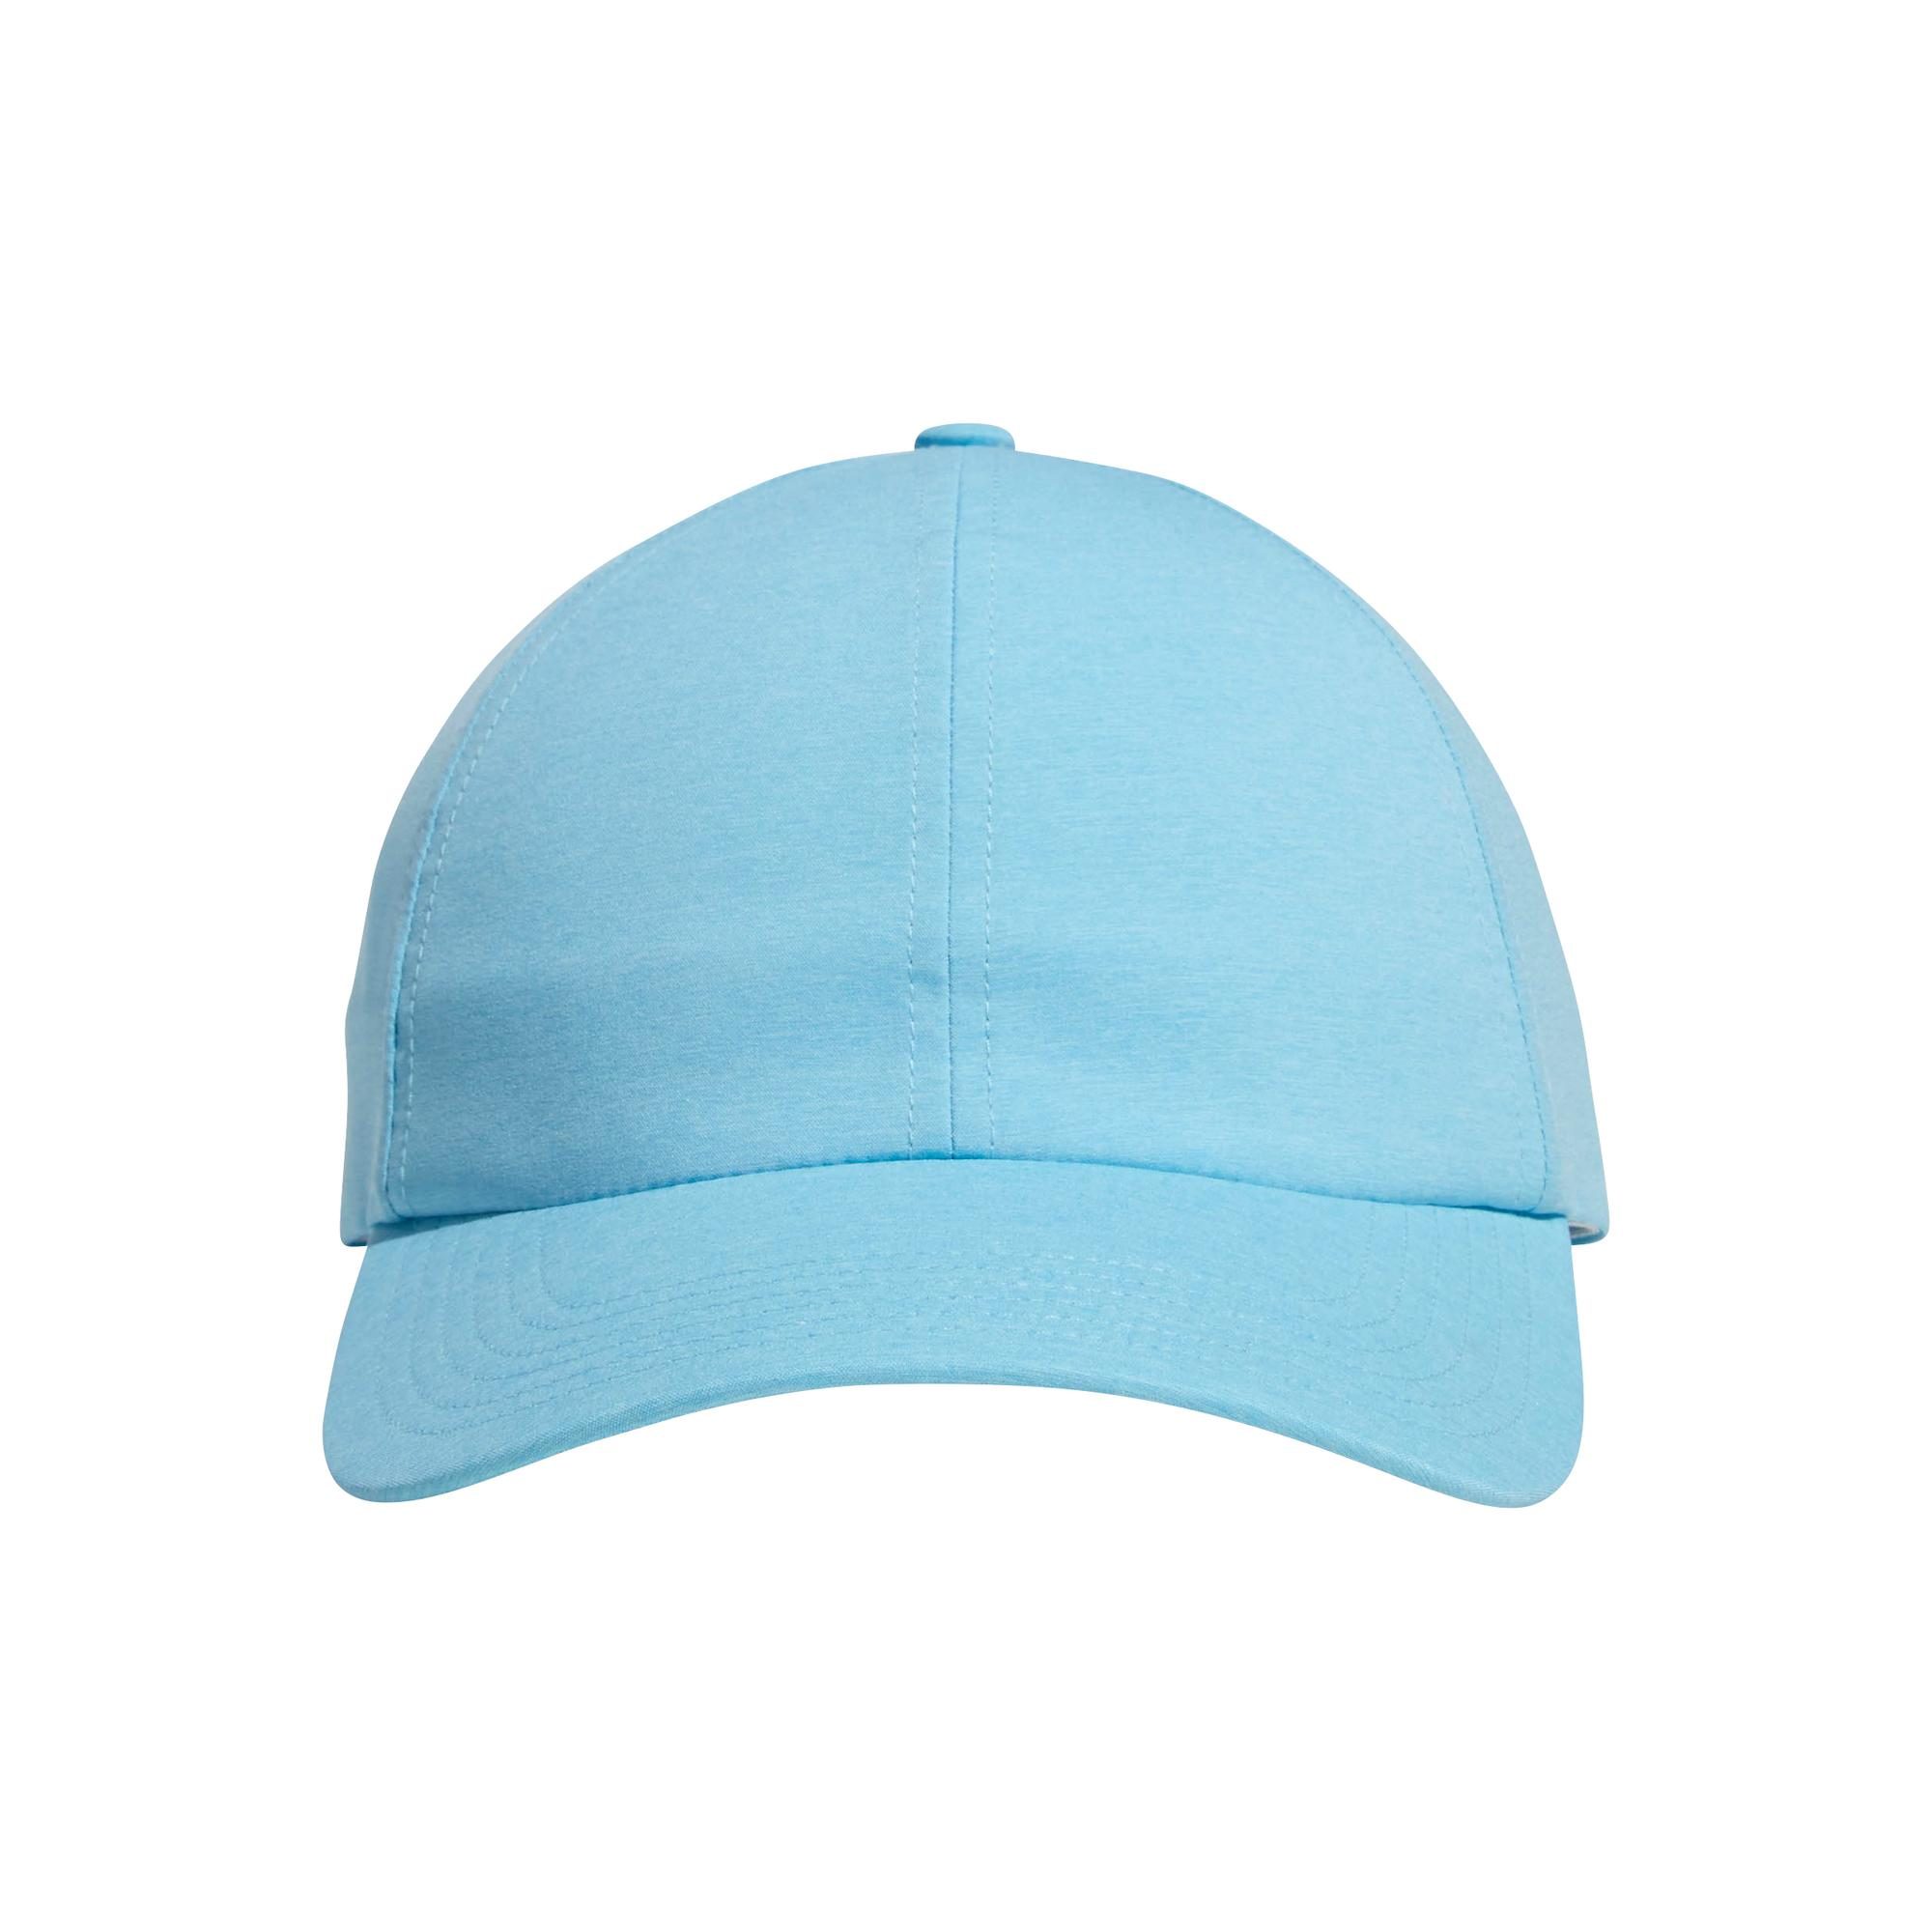 Women's Crestable Heathered Cap